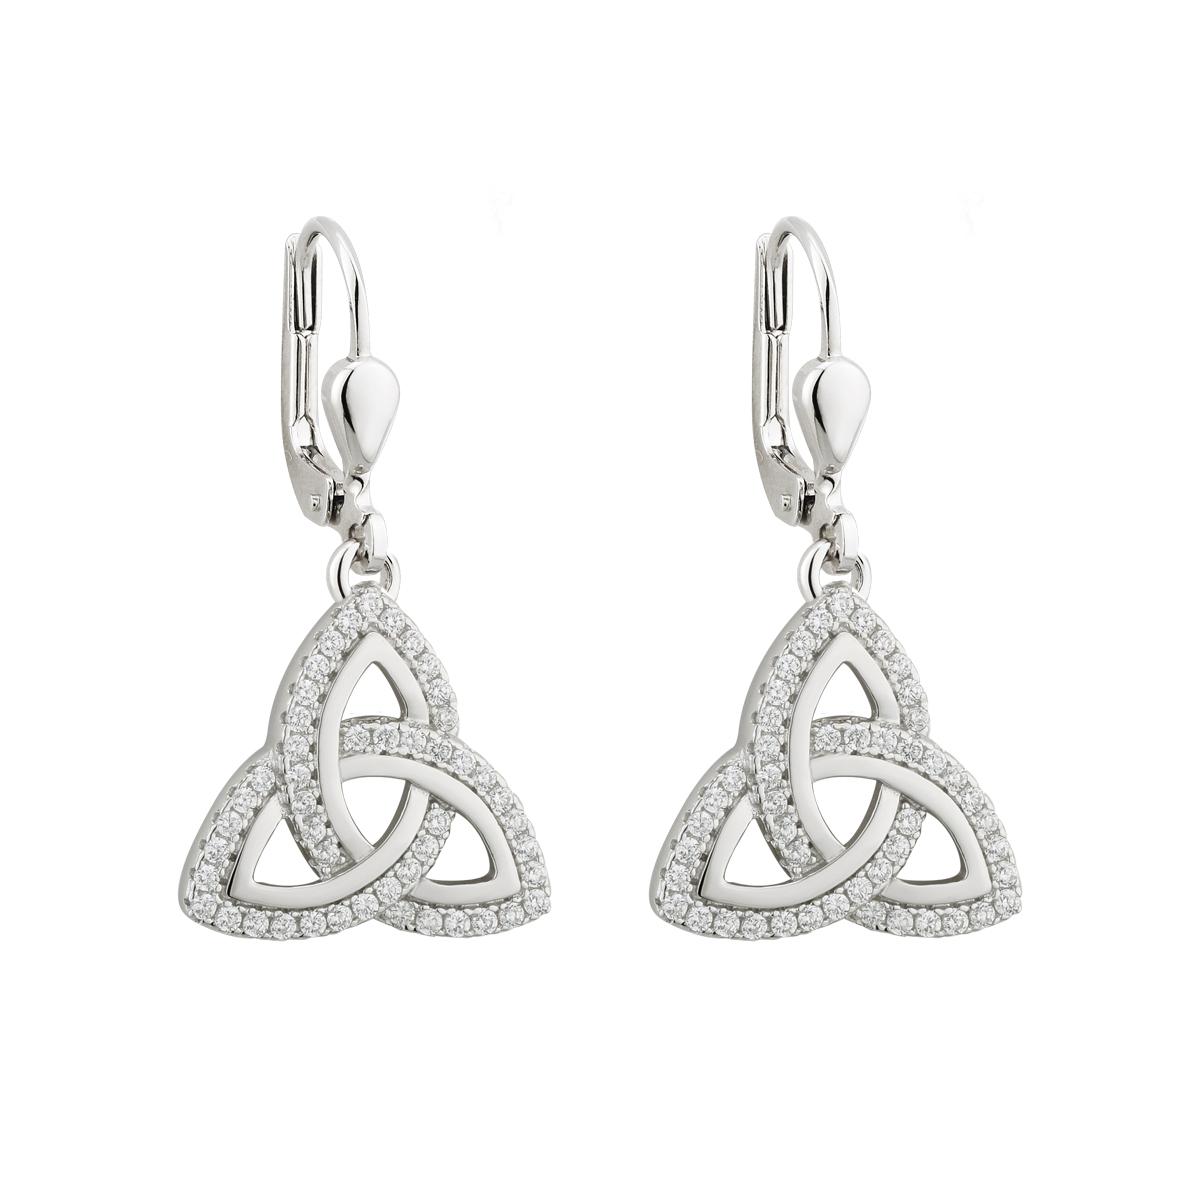 3603db5f6 Solvar Drop Trinity Knot Earrings s33699-Skellig Gift Store